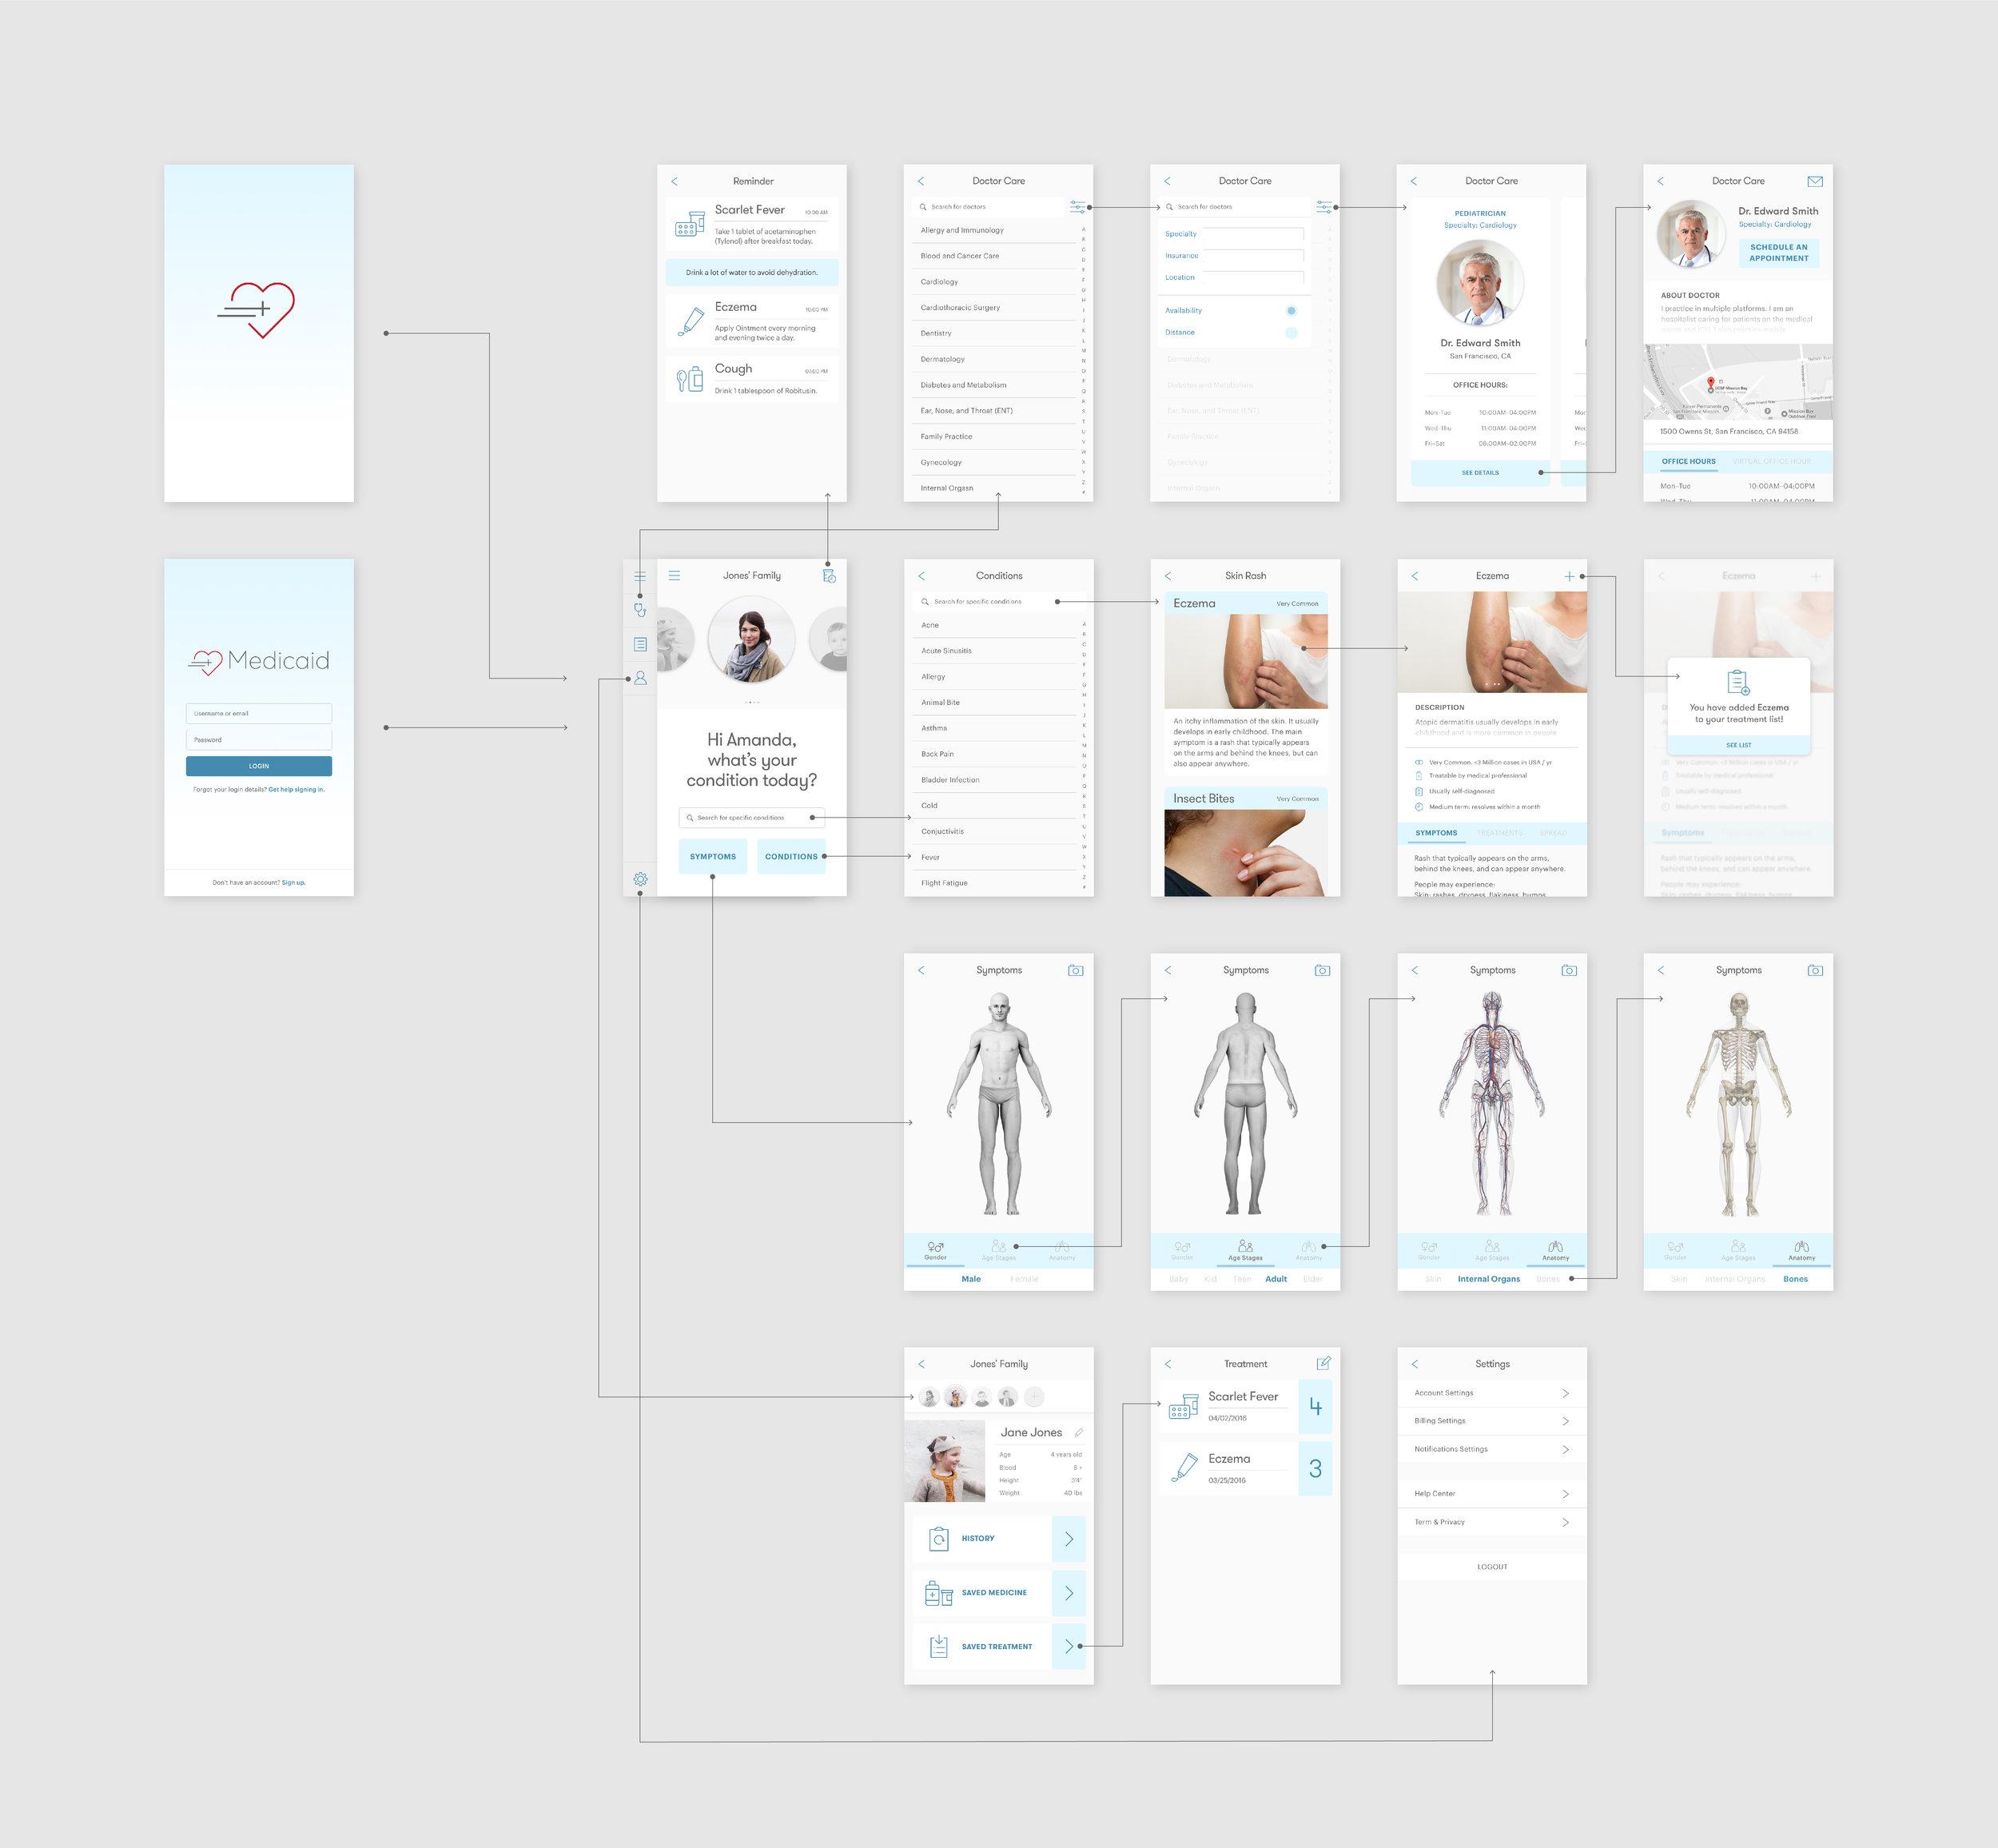 Medicaid_Flowchart-04.jpg